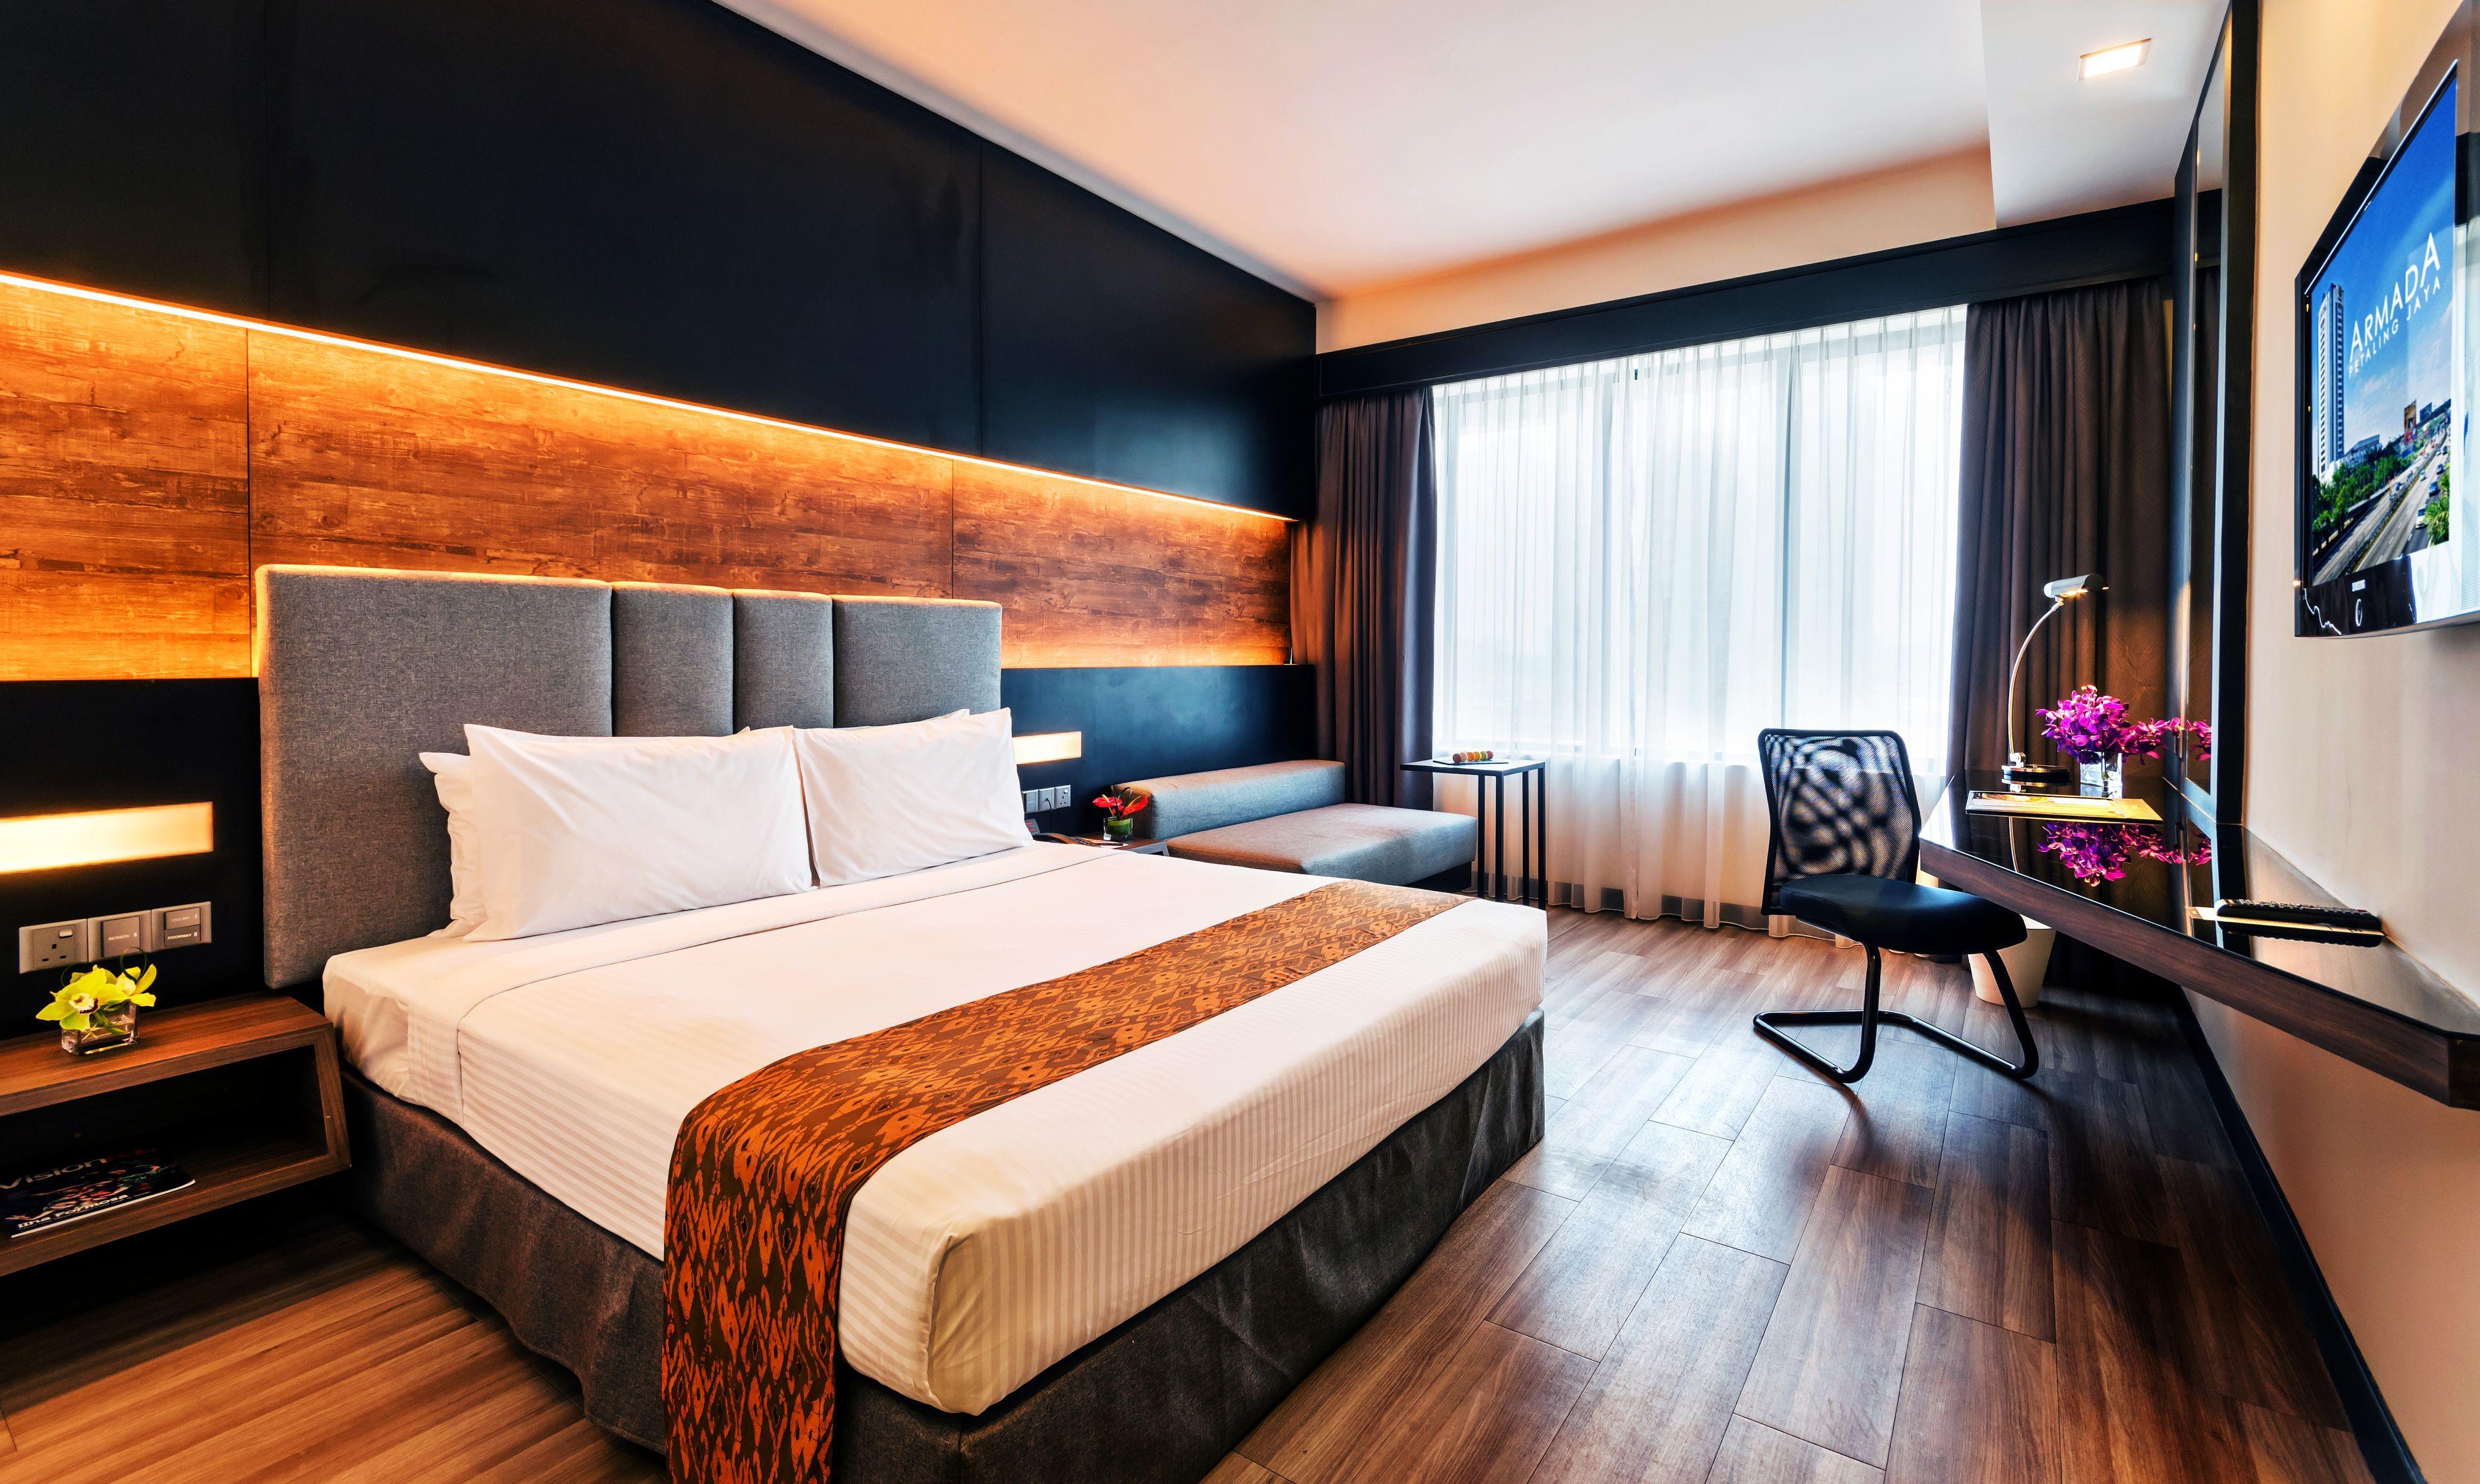 Courtesy of Hotel Armada Petaling Jaya / Expedia